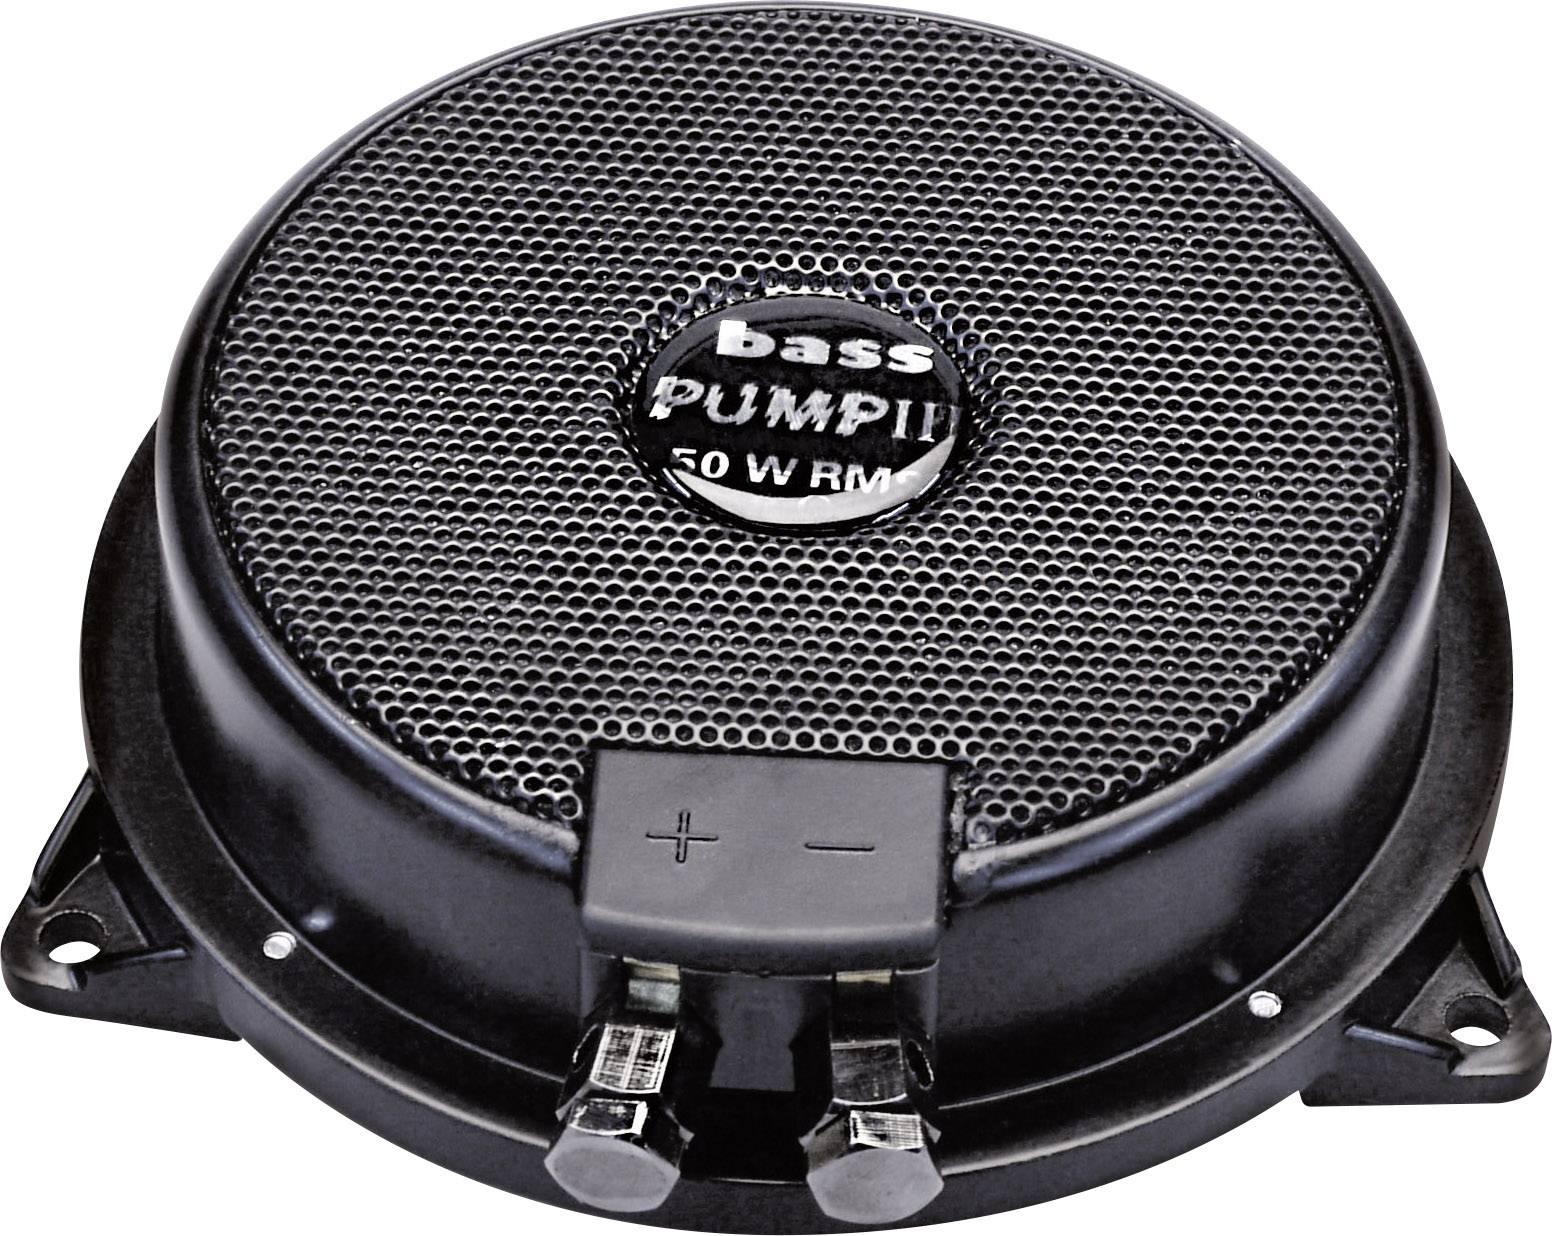 Conrad BASS PUMP III 8 OHM Car Speakers